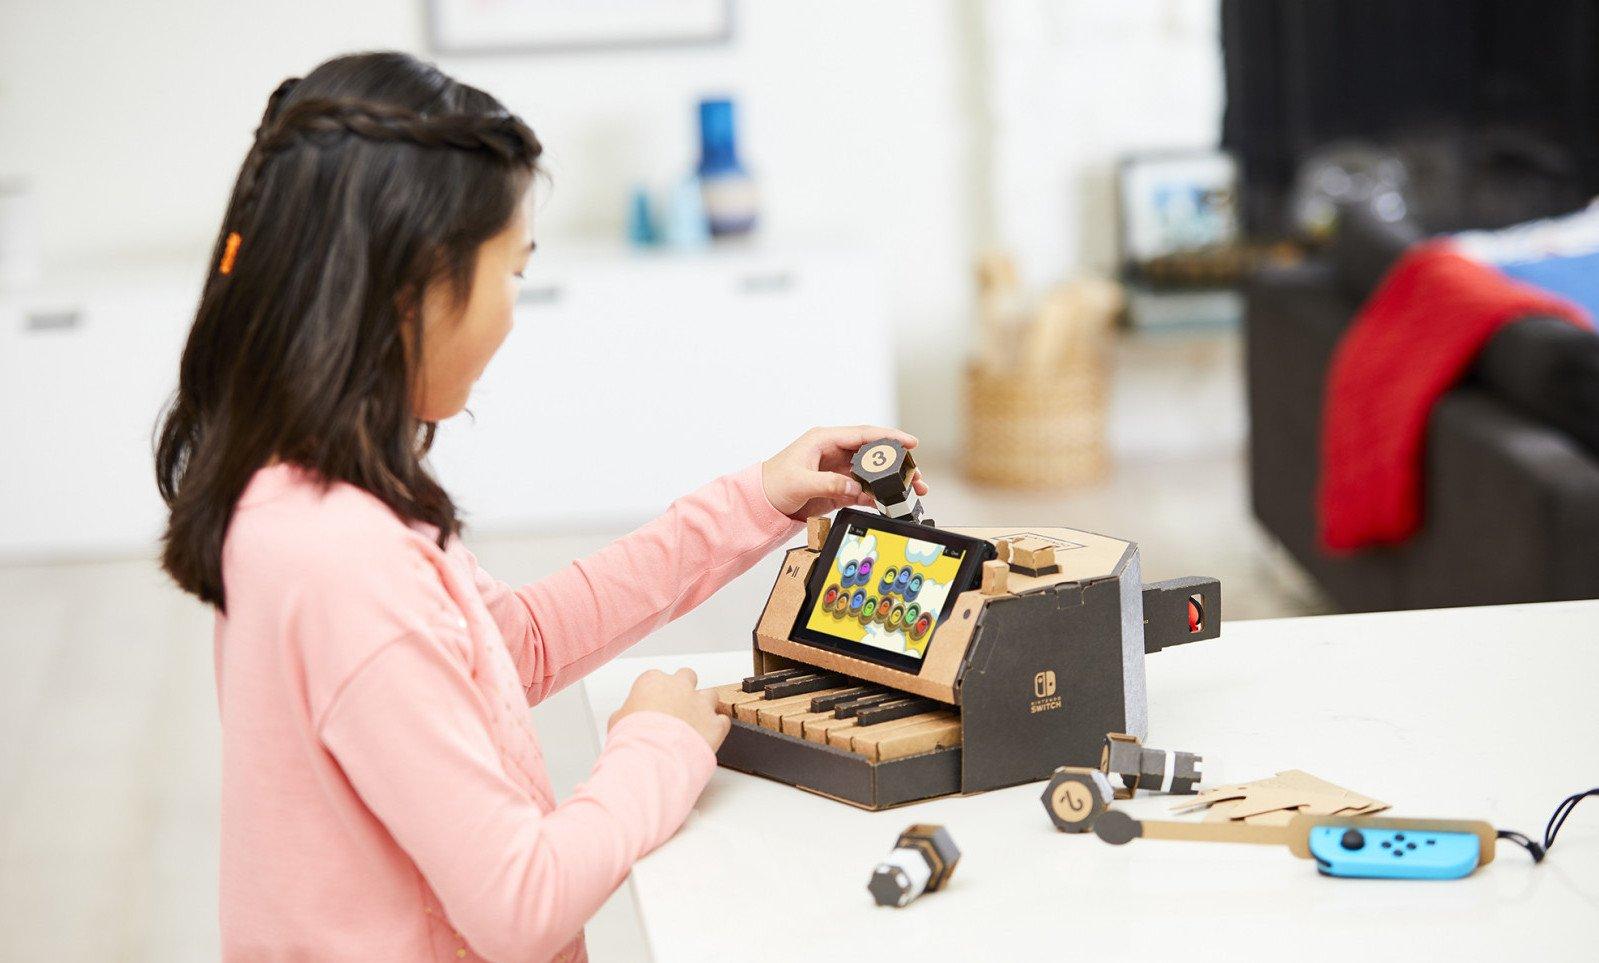 Nintendo Labo Lets You Build DIY Cardboard Creations | All3DP